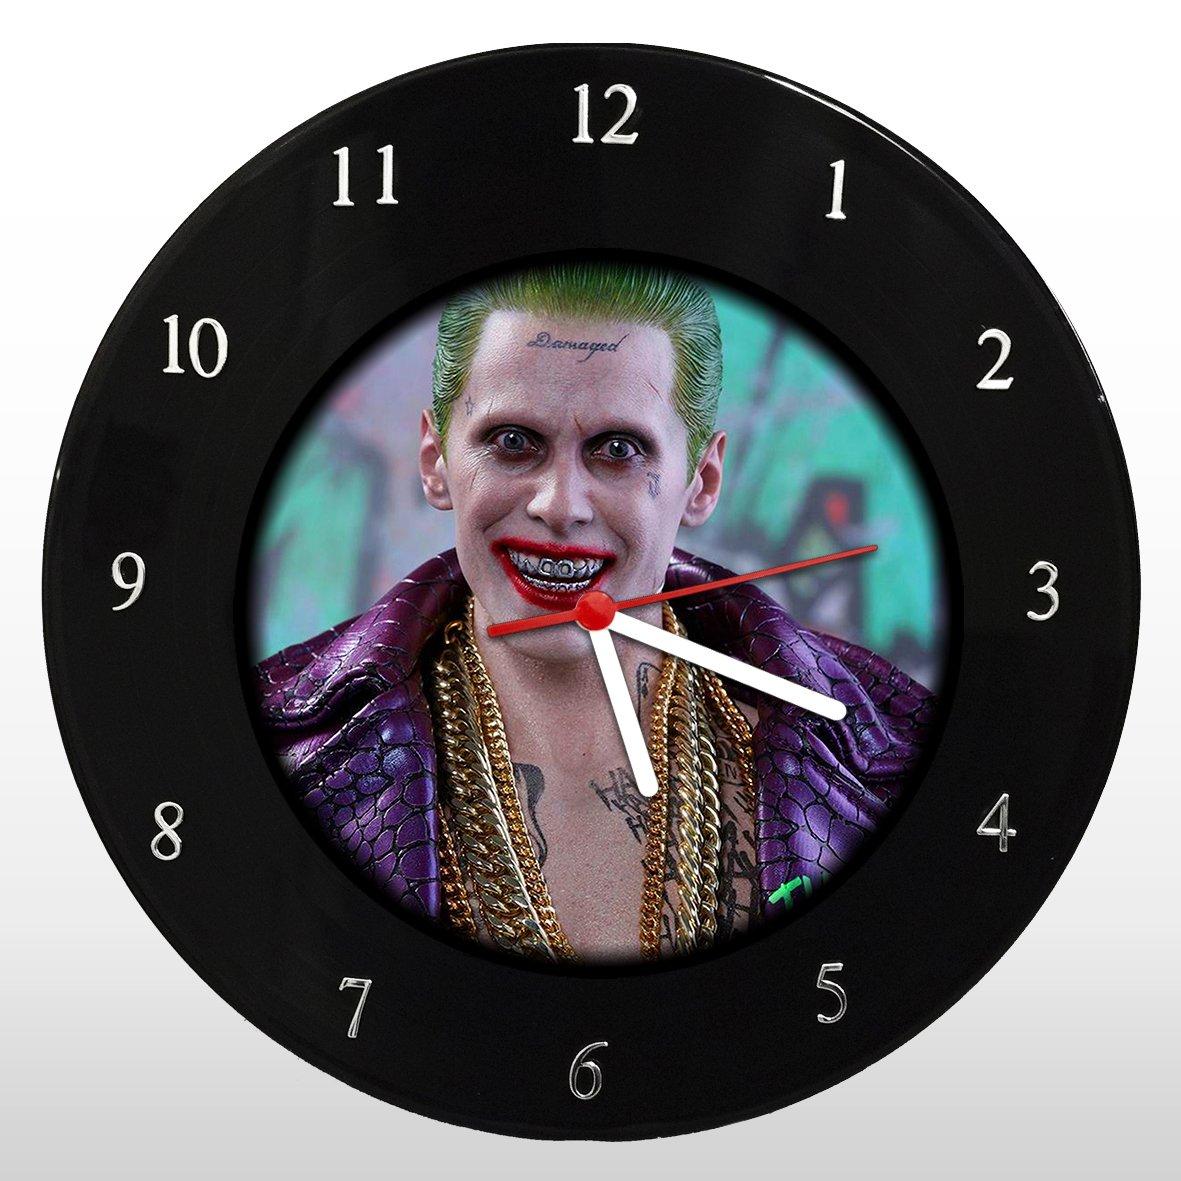 Coringa - Jared Leto - Relógio de Parede em Disco de Vinil - Mr. Rock